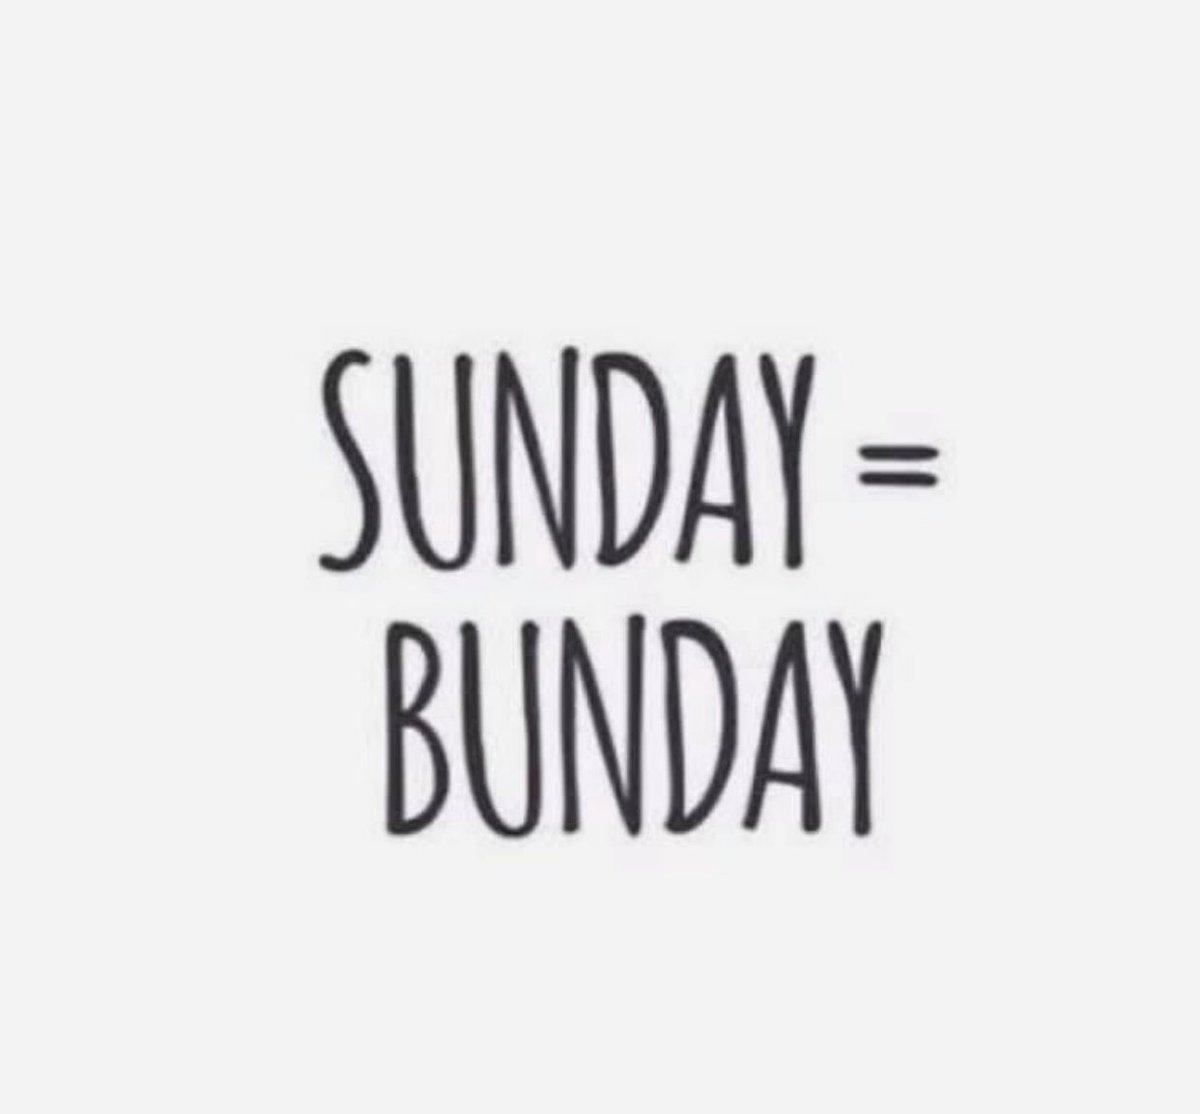 406-272-0070 BOOK Online 24/7https://go.booker.com/Studio406salon #Sunday #Sundayvibes #Sundayfunday #Salon #406hair #Studio406salon #BillingsHair #Billings #MT #lashes #Beauty #Spa #Wellness #Treatyourself #Regram #IGpic.twitter.com/Zu7FdaLXd0